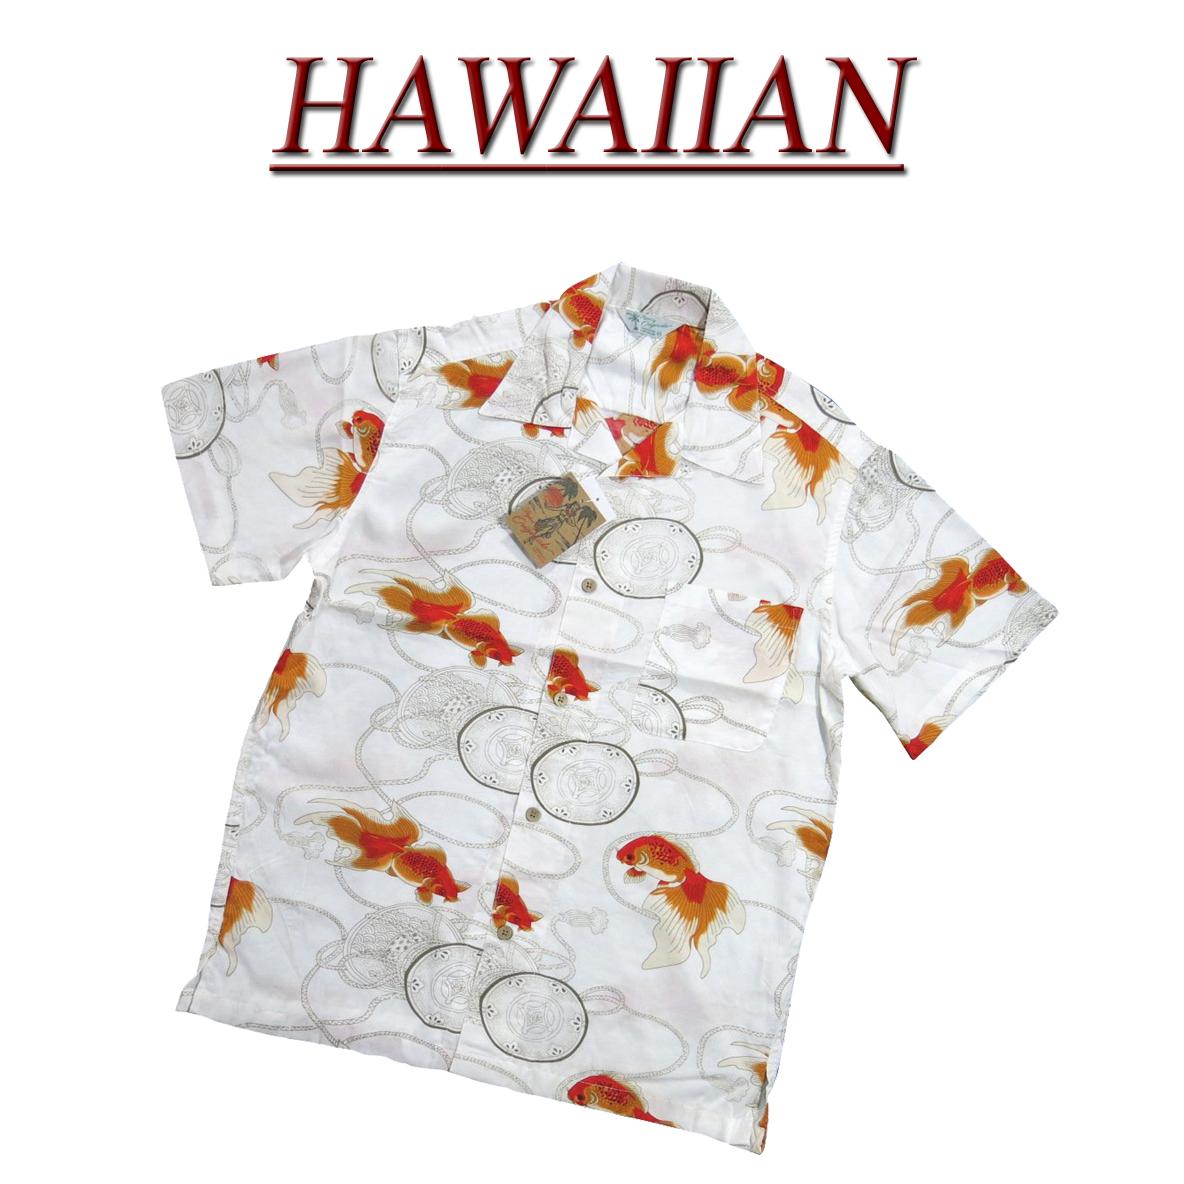 wu2310 品牌新金鱼鼓短袖人造丝 100%日本夏威夷衬衫男士 Aloha 夏威夷衬衫 (那里大尺码!)